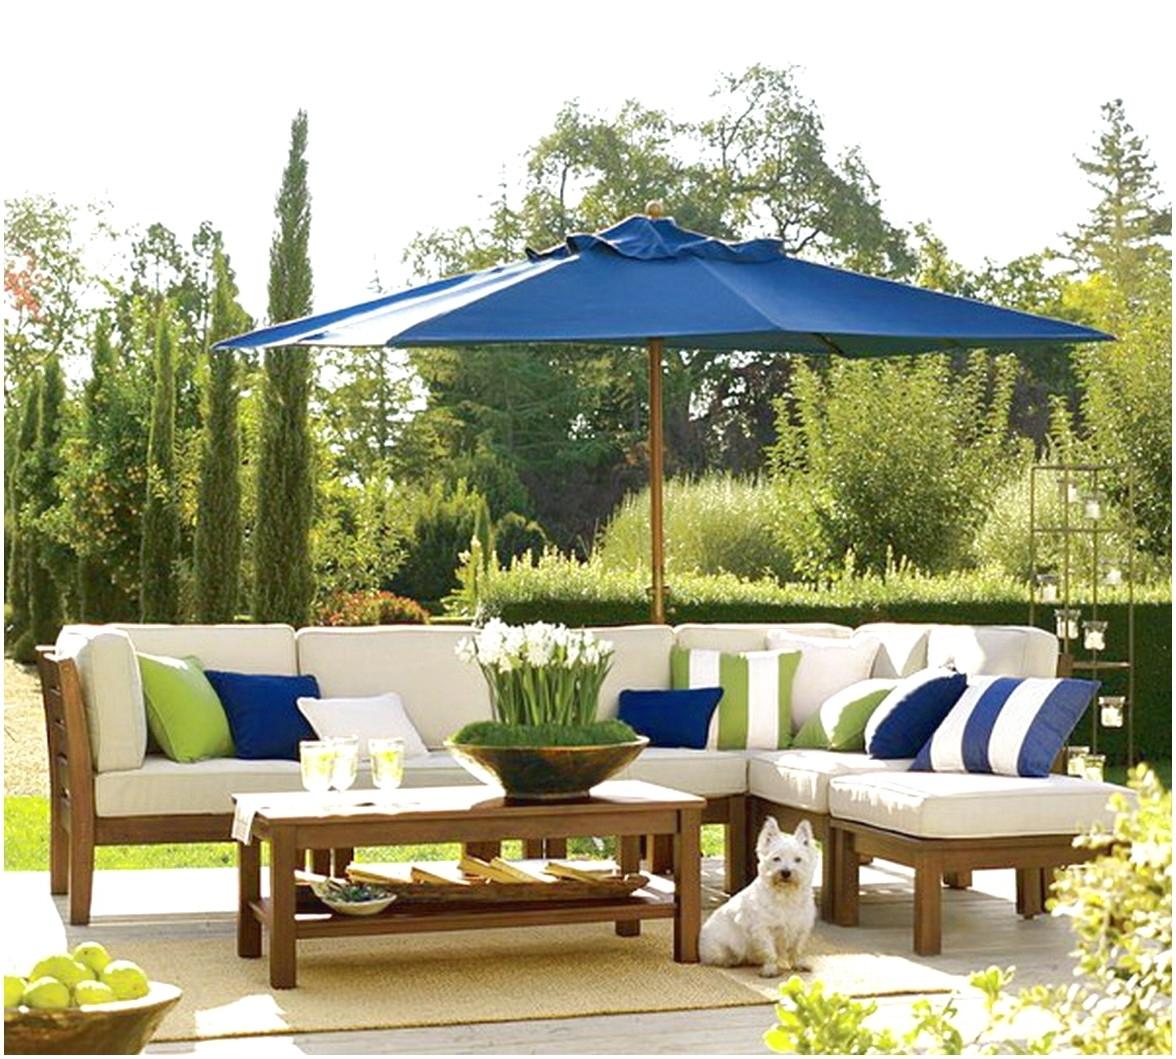 Preferred Outdoor Patio Furniture With Blue Patio Umbrella : Surprising Design Intended For Blue Patio Umbrellas (View 16 of 20)